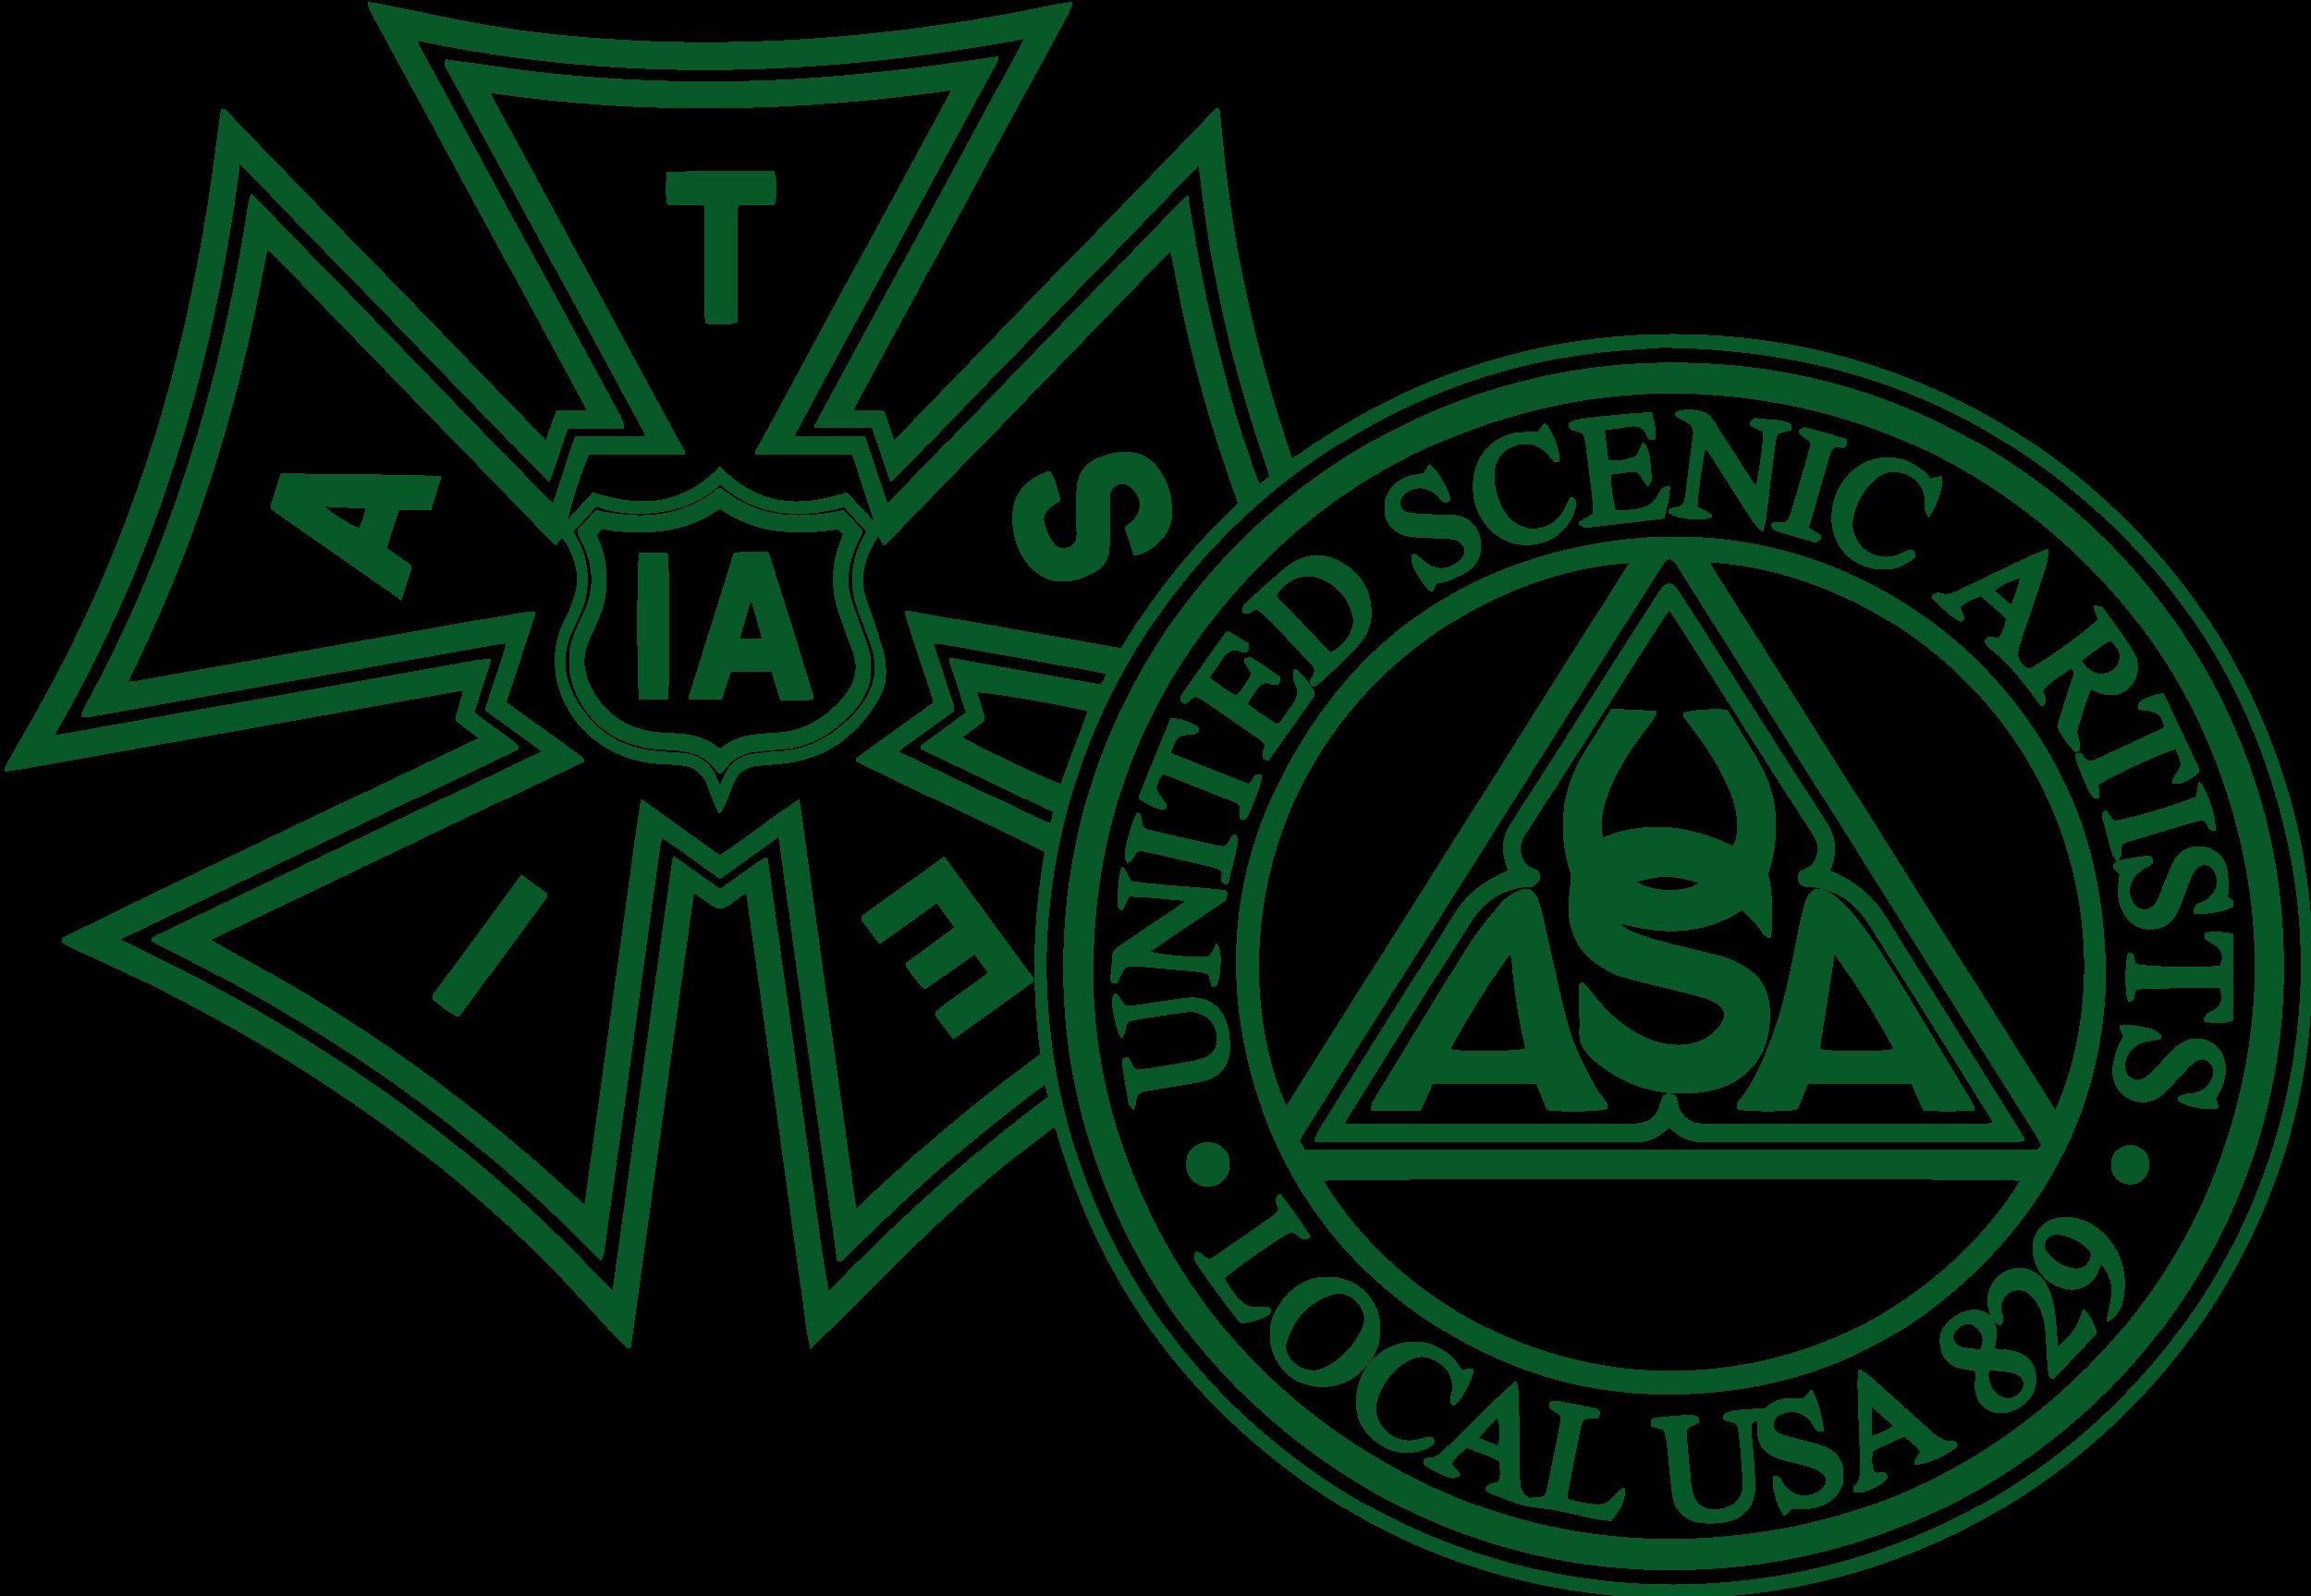 USA-829-IA-Double-Logo_Green-01.png